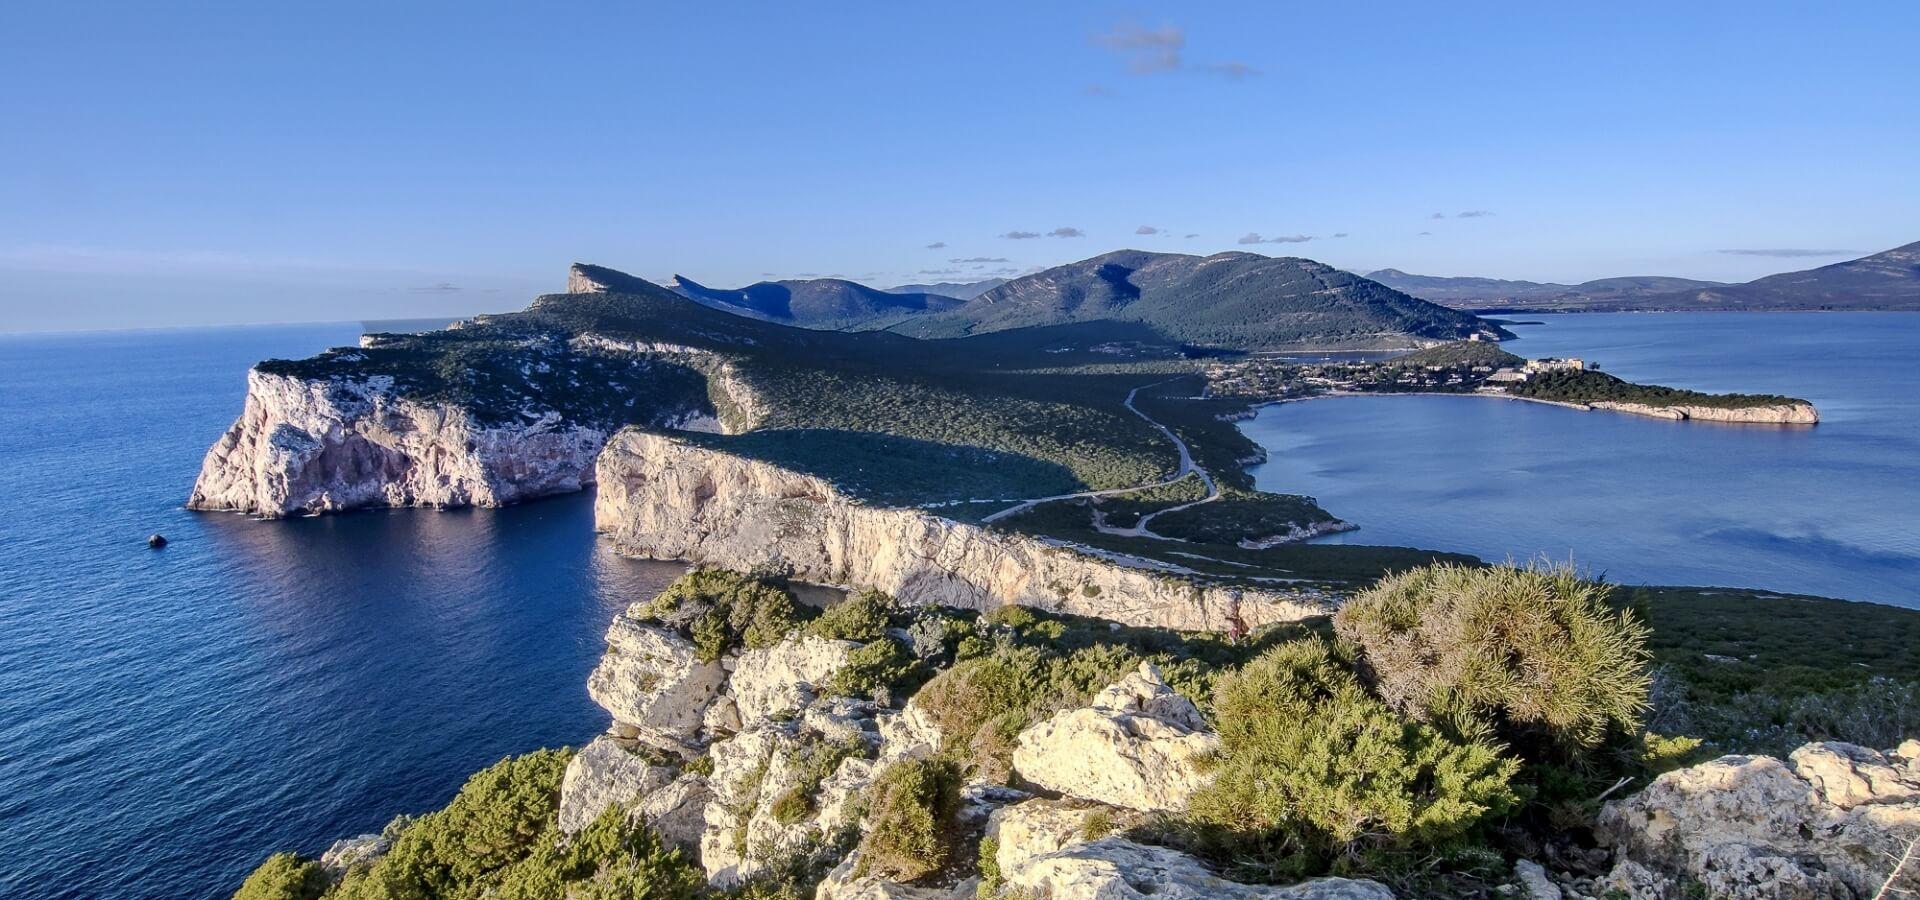 Vista panoramica Capocaccia Isola Piana